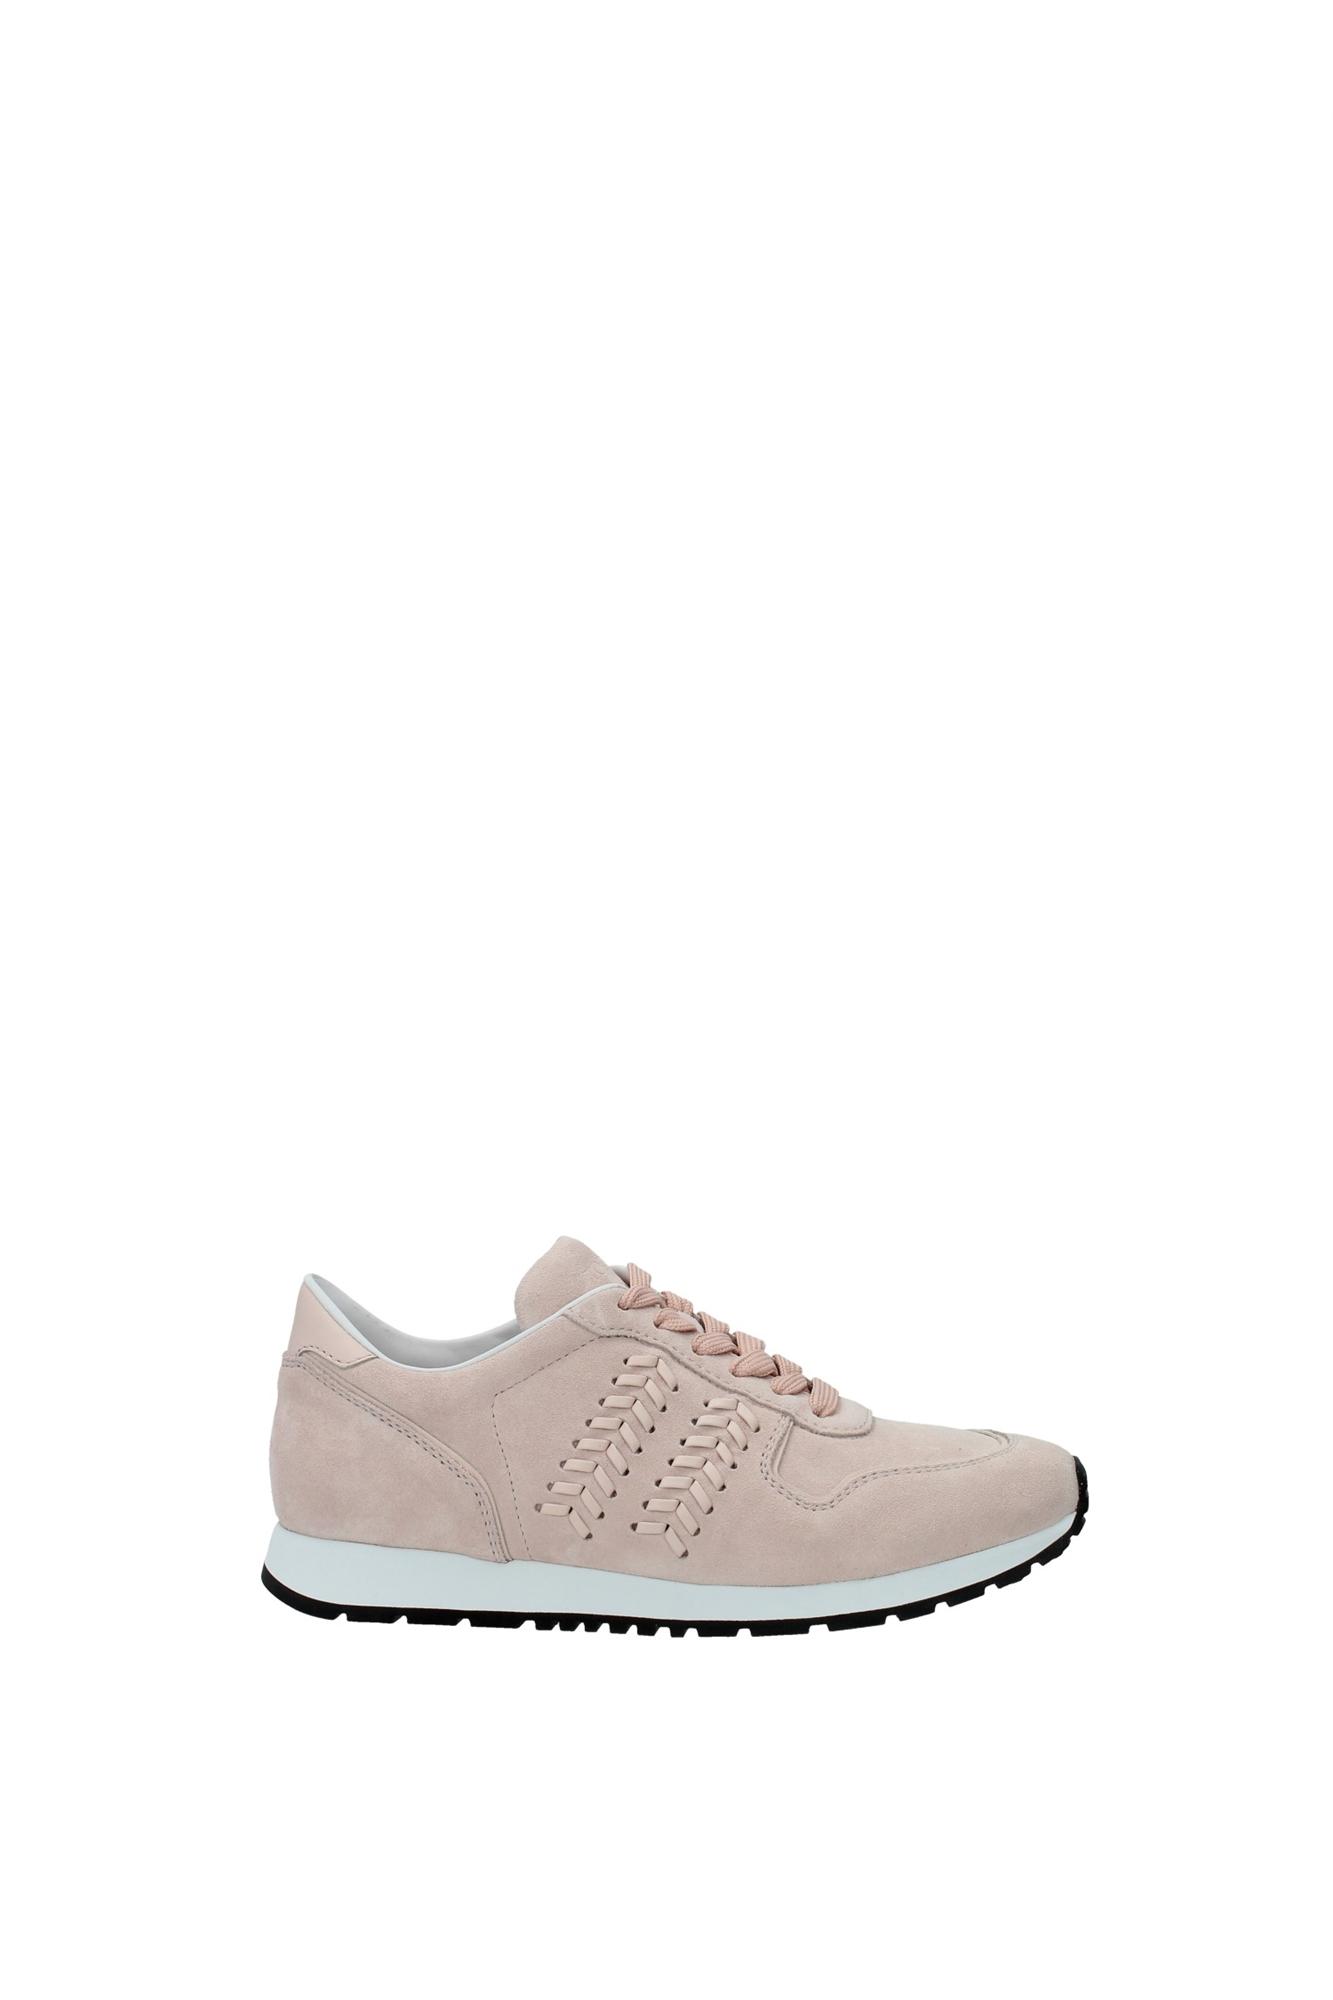 info for e6885 25b67 ... Nike SB Zoom Blazer Low Decon Mens Suede Light Bone Bone Bone Shoes  Brand New Size ...